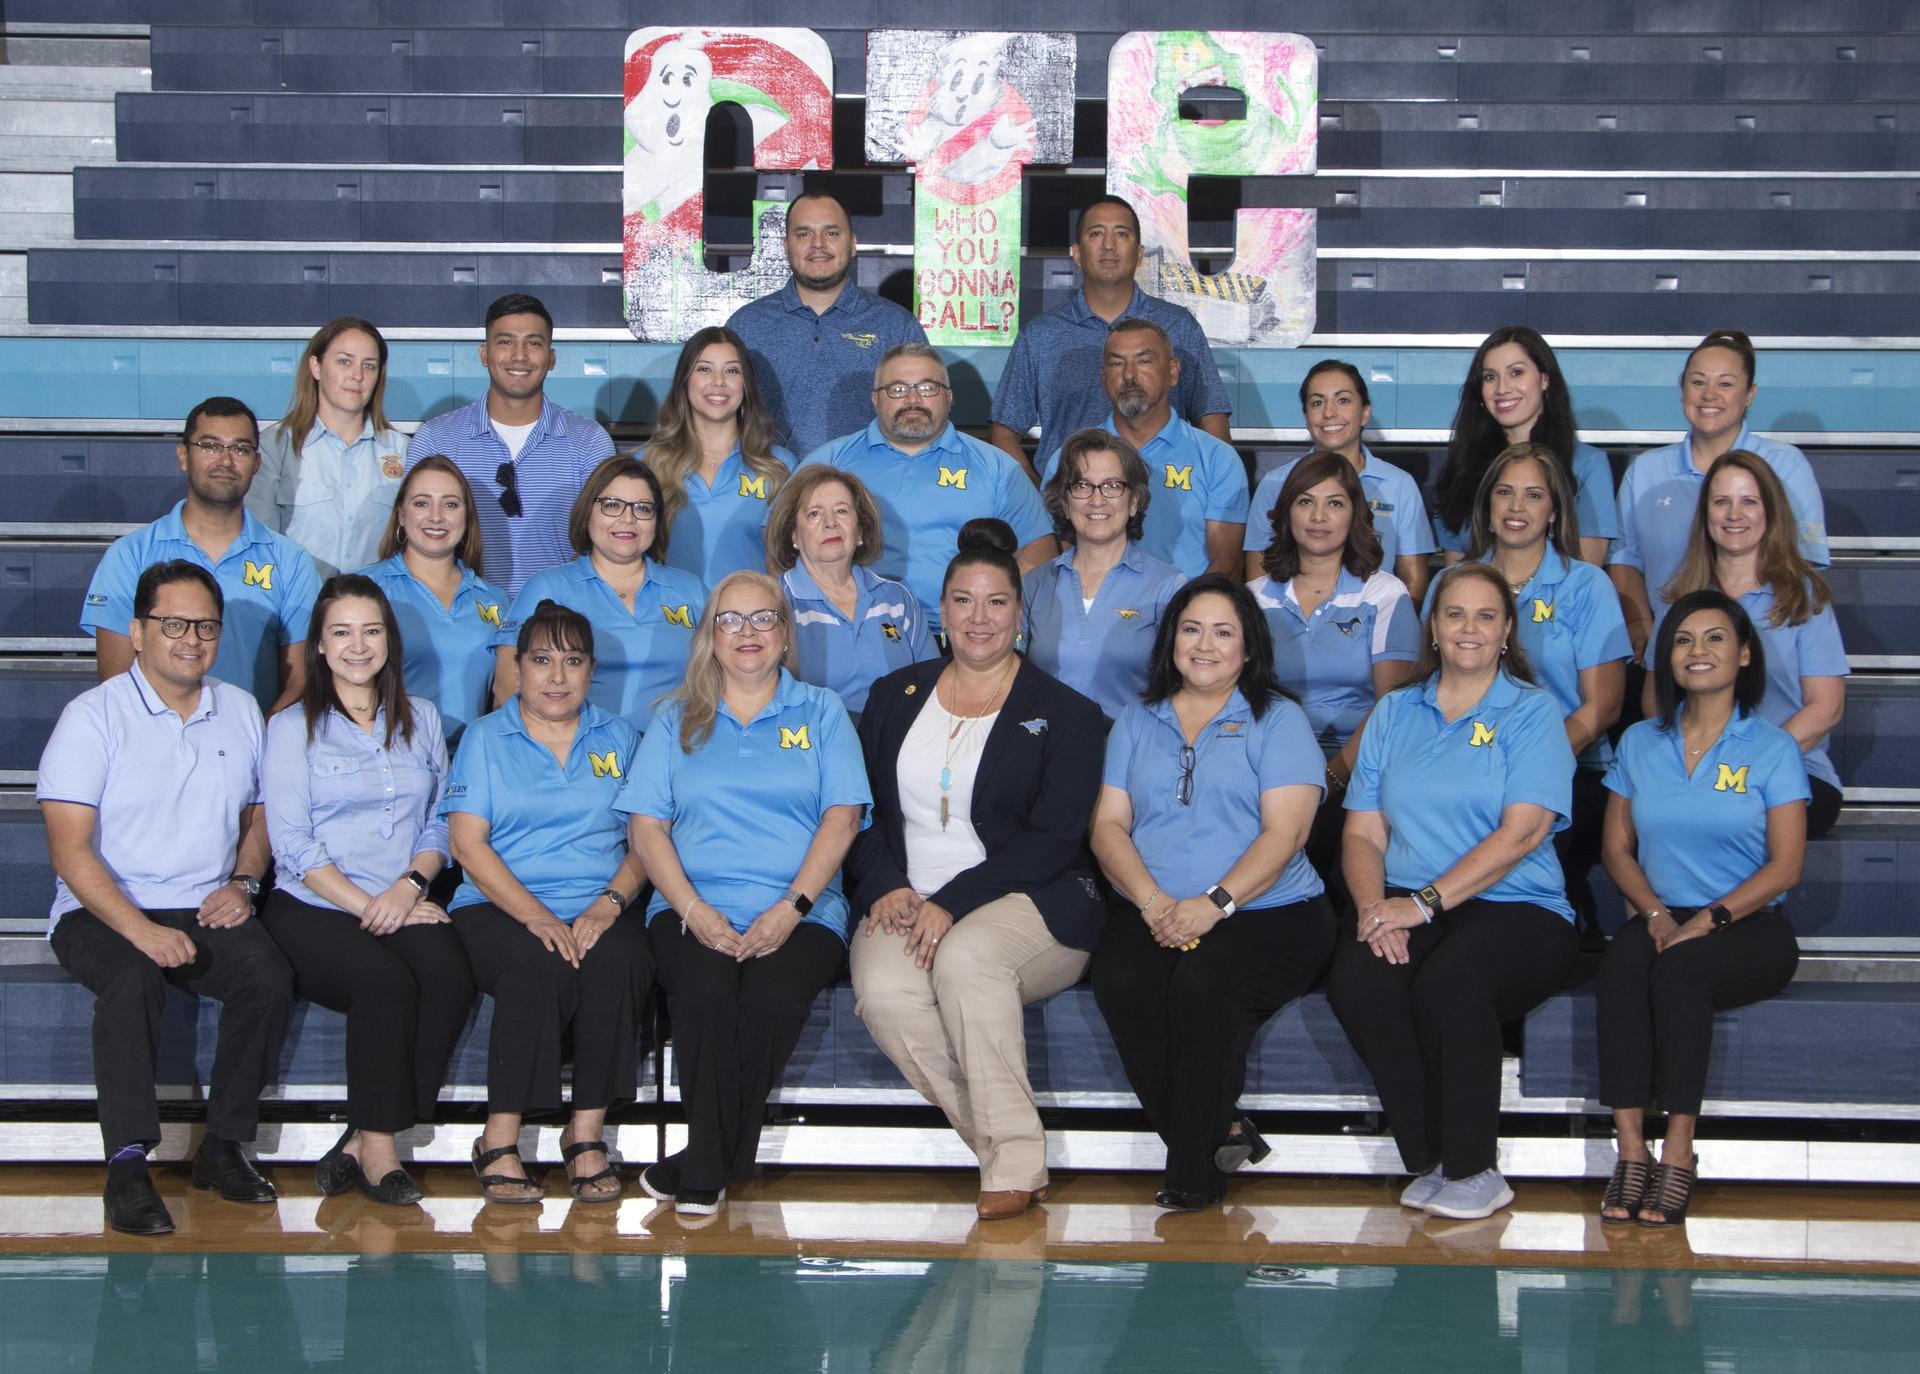 Memorial High School CTE Team